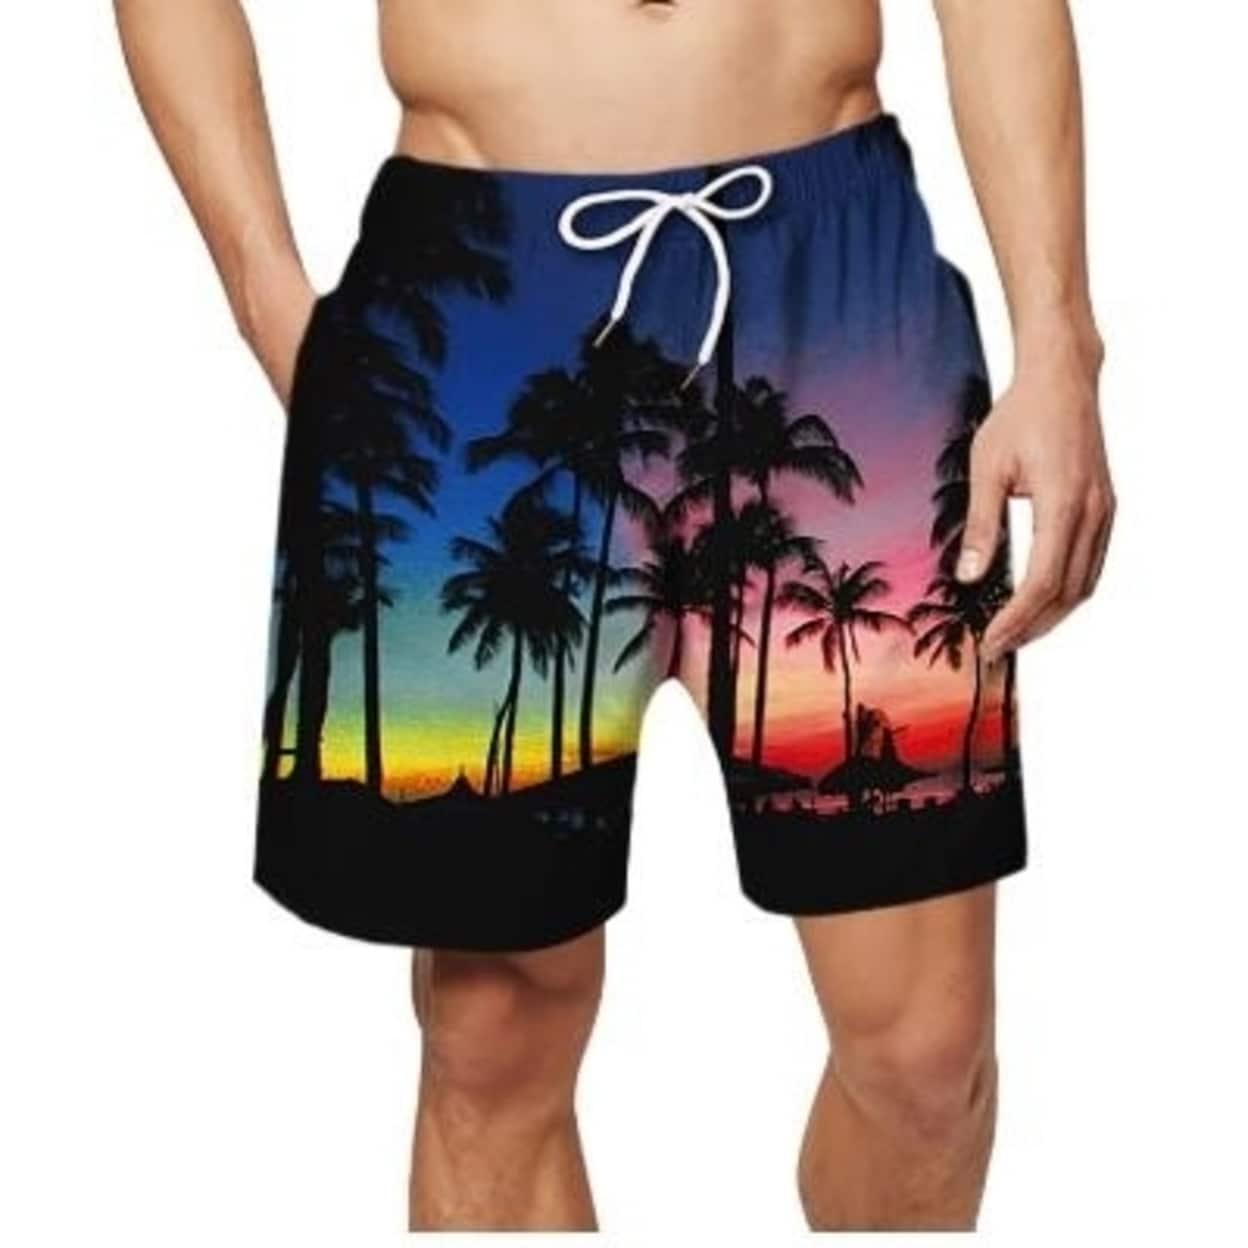 LONGTA Men Swim Trunks Drawstring Elastic Waist Surfing Beach Board Shorts